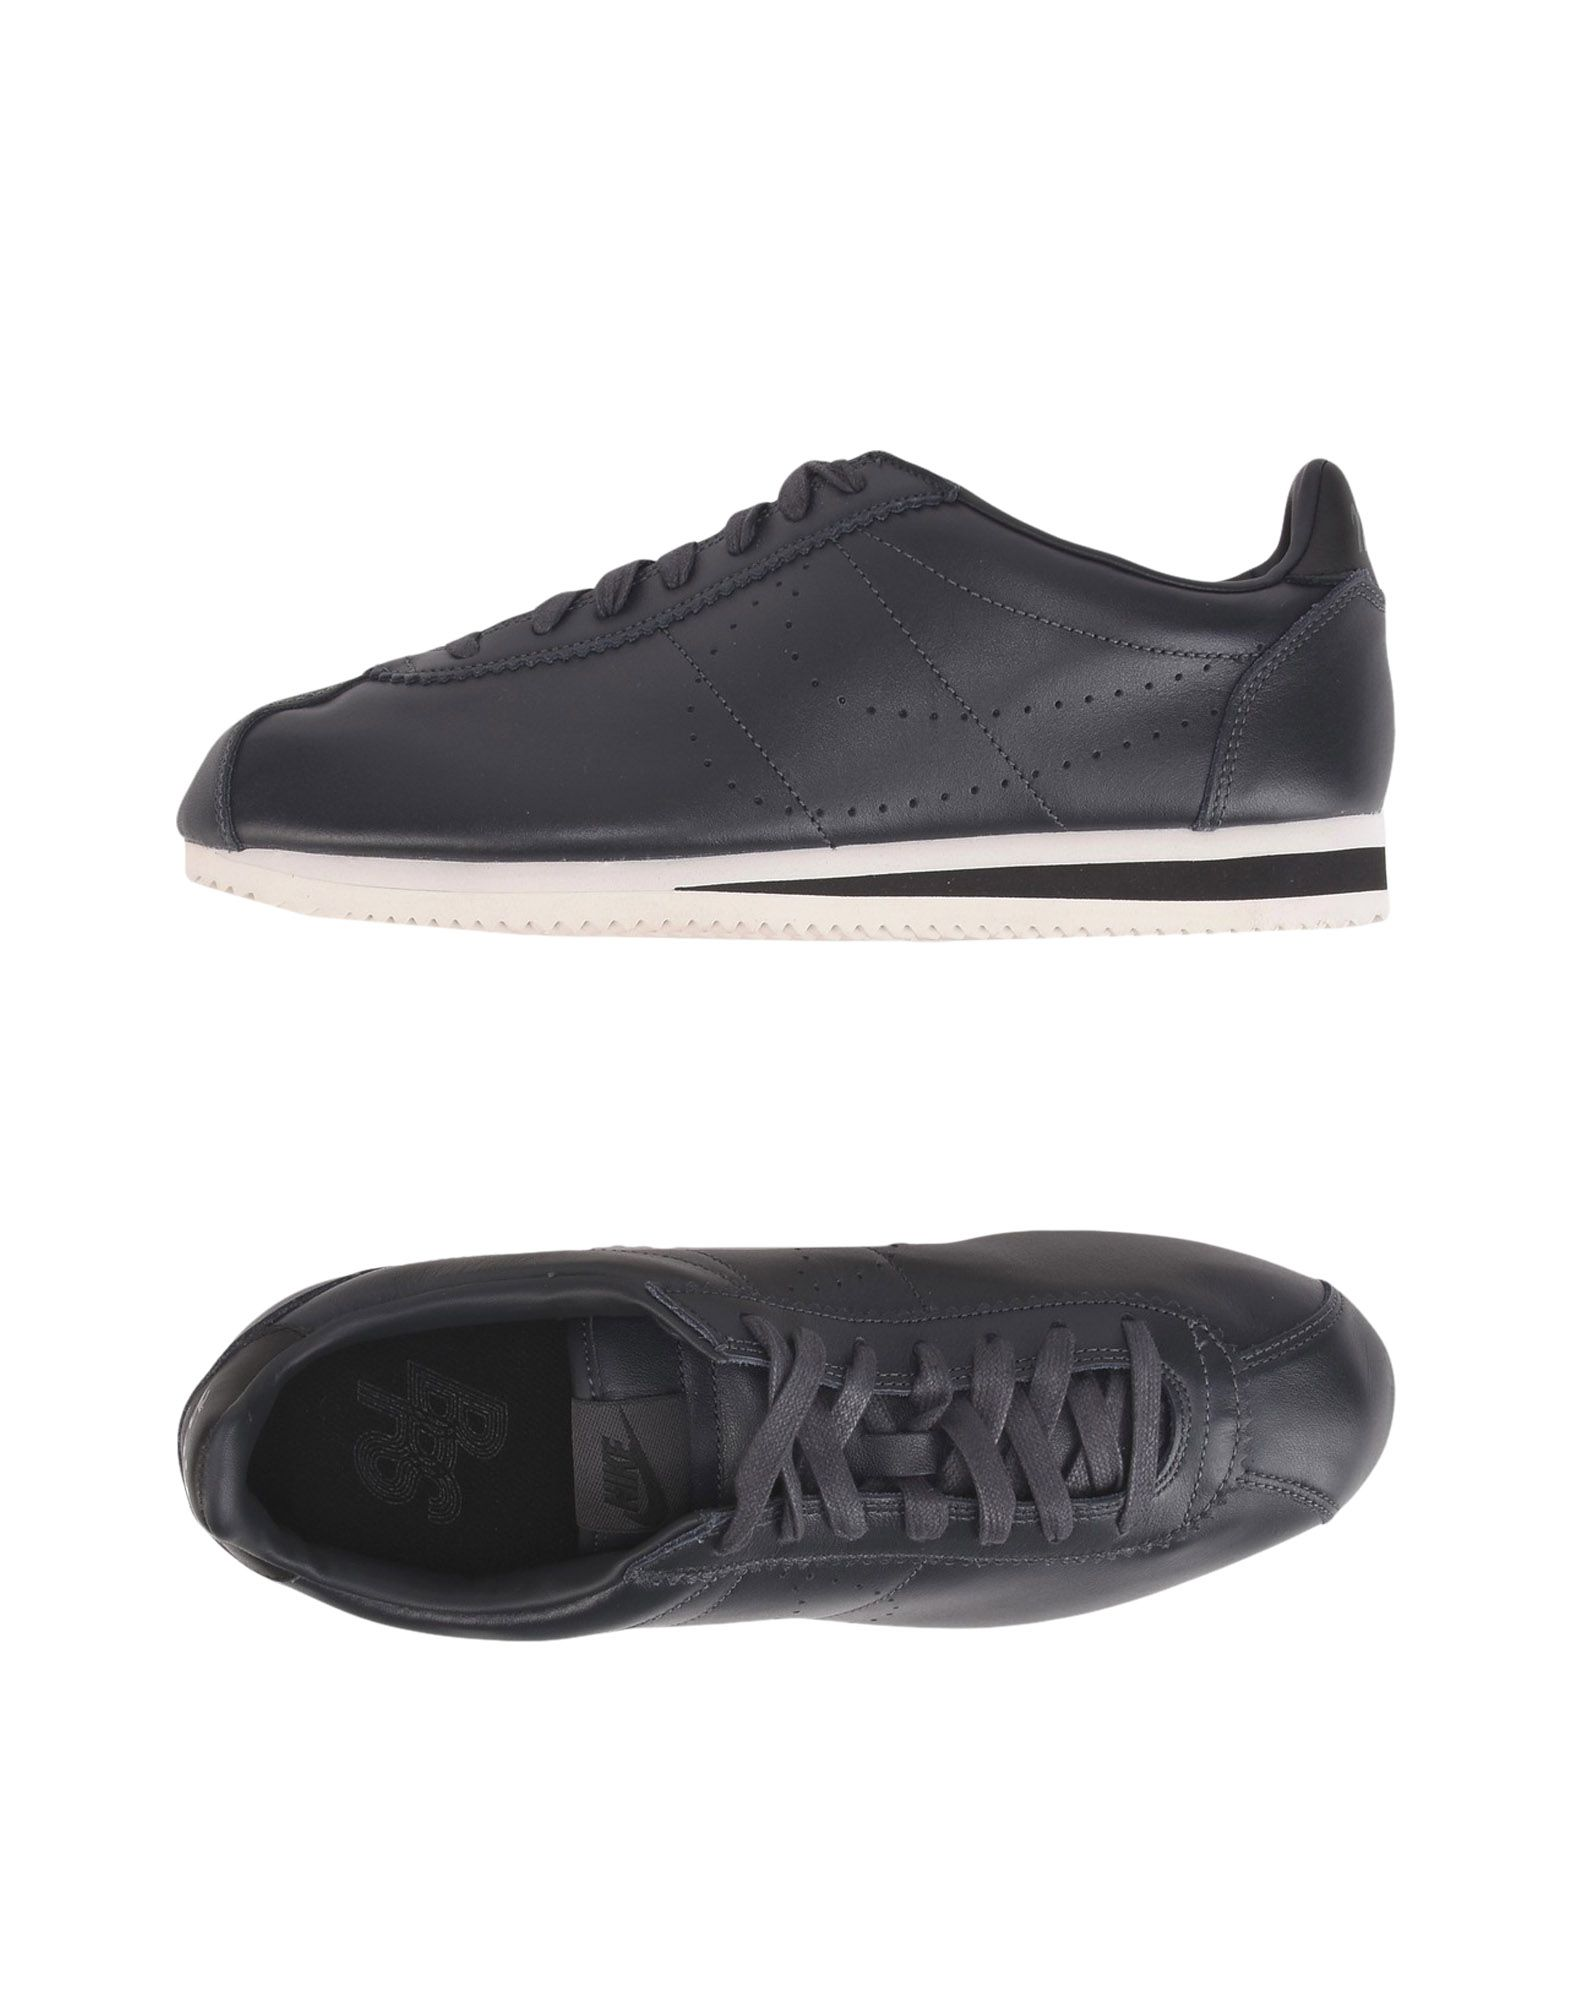 Baskets Nike Classic Cortez Leather Premium - Homme - baskets Nike   - 11441161NA